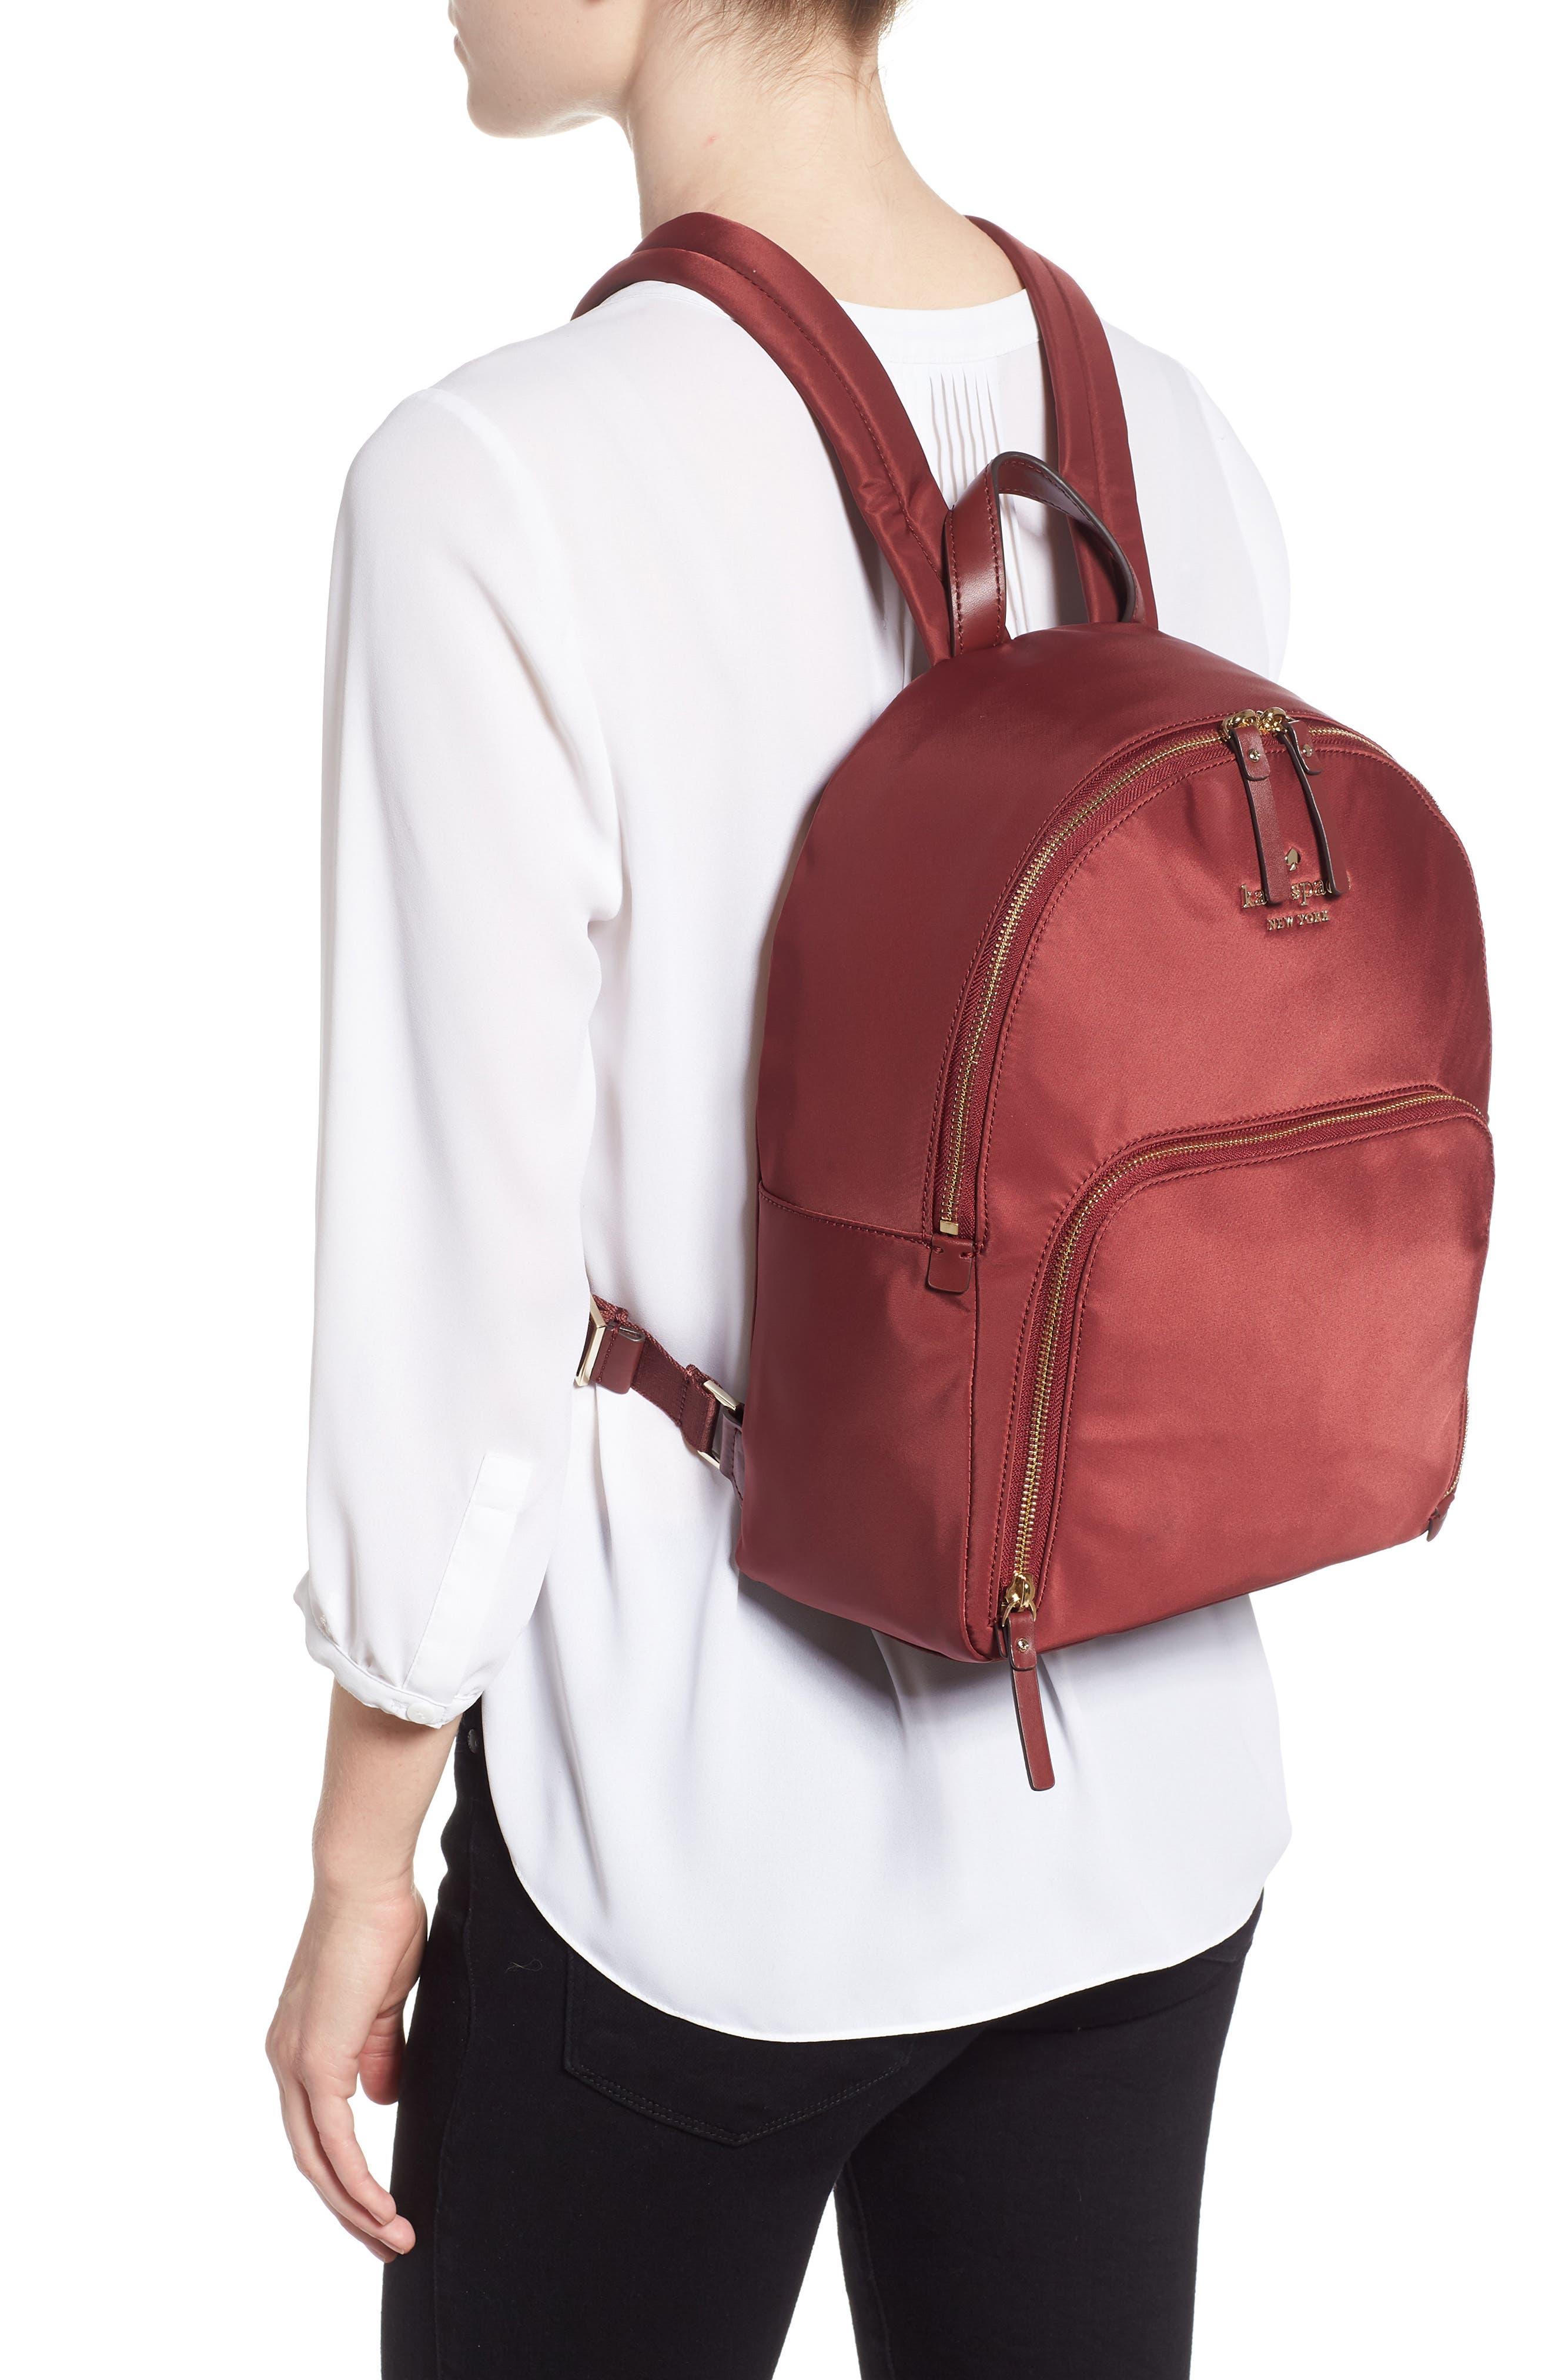 watson lane - hartley nylon backpack,                             Alternate thumbnail 2, color,                             DARK CURRANT